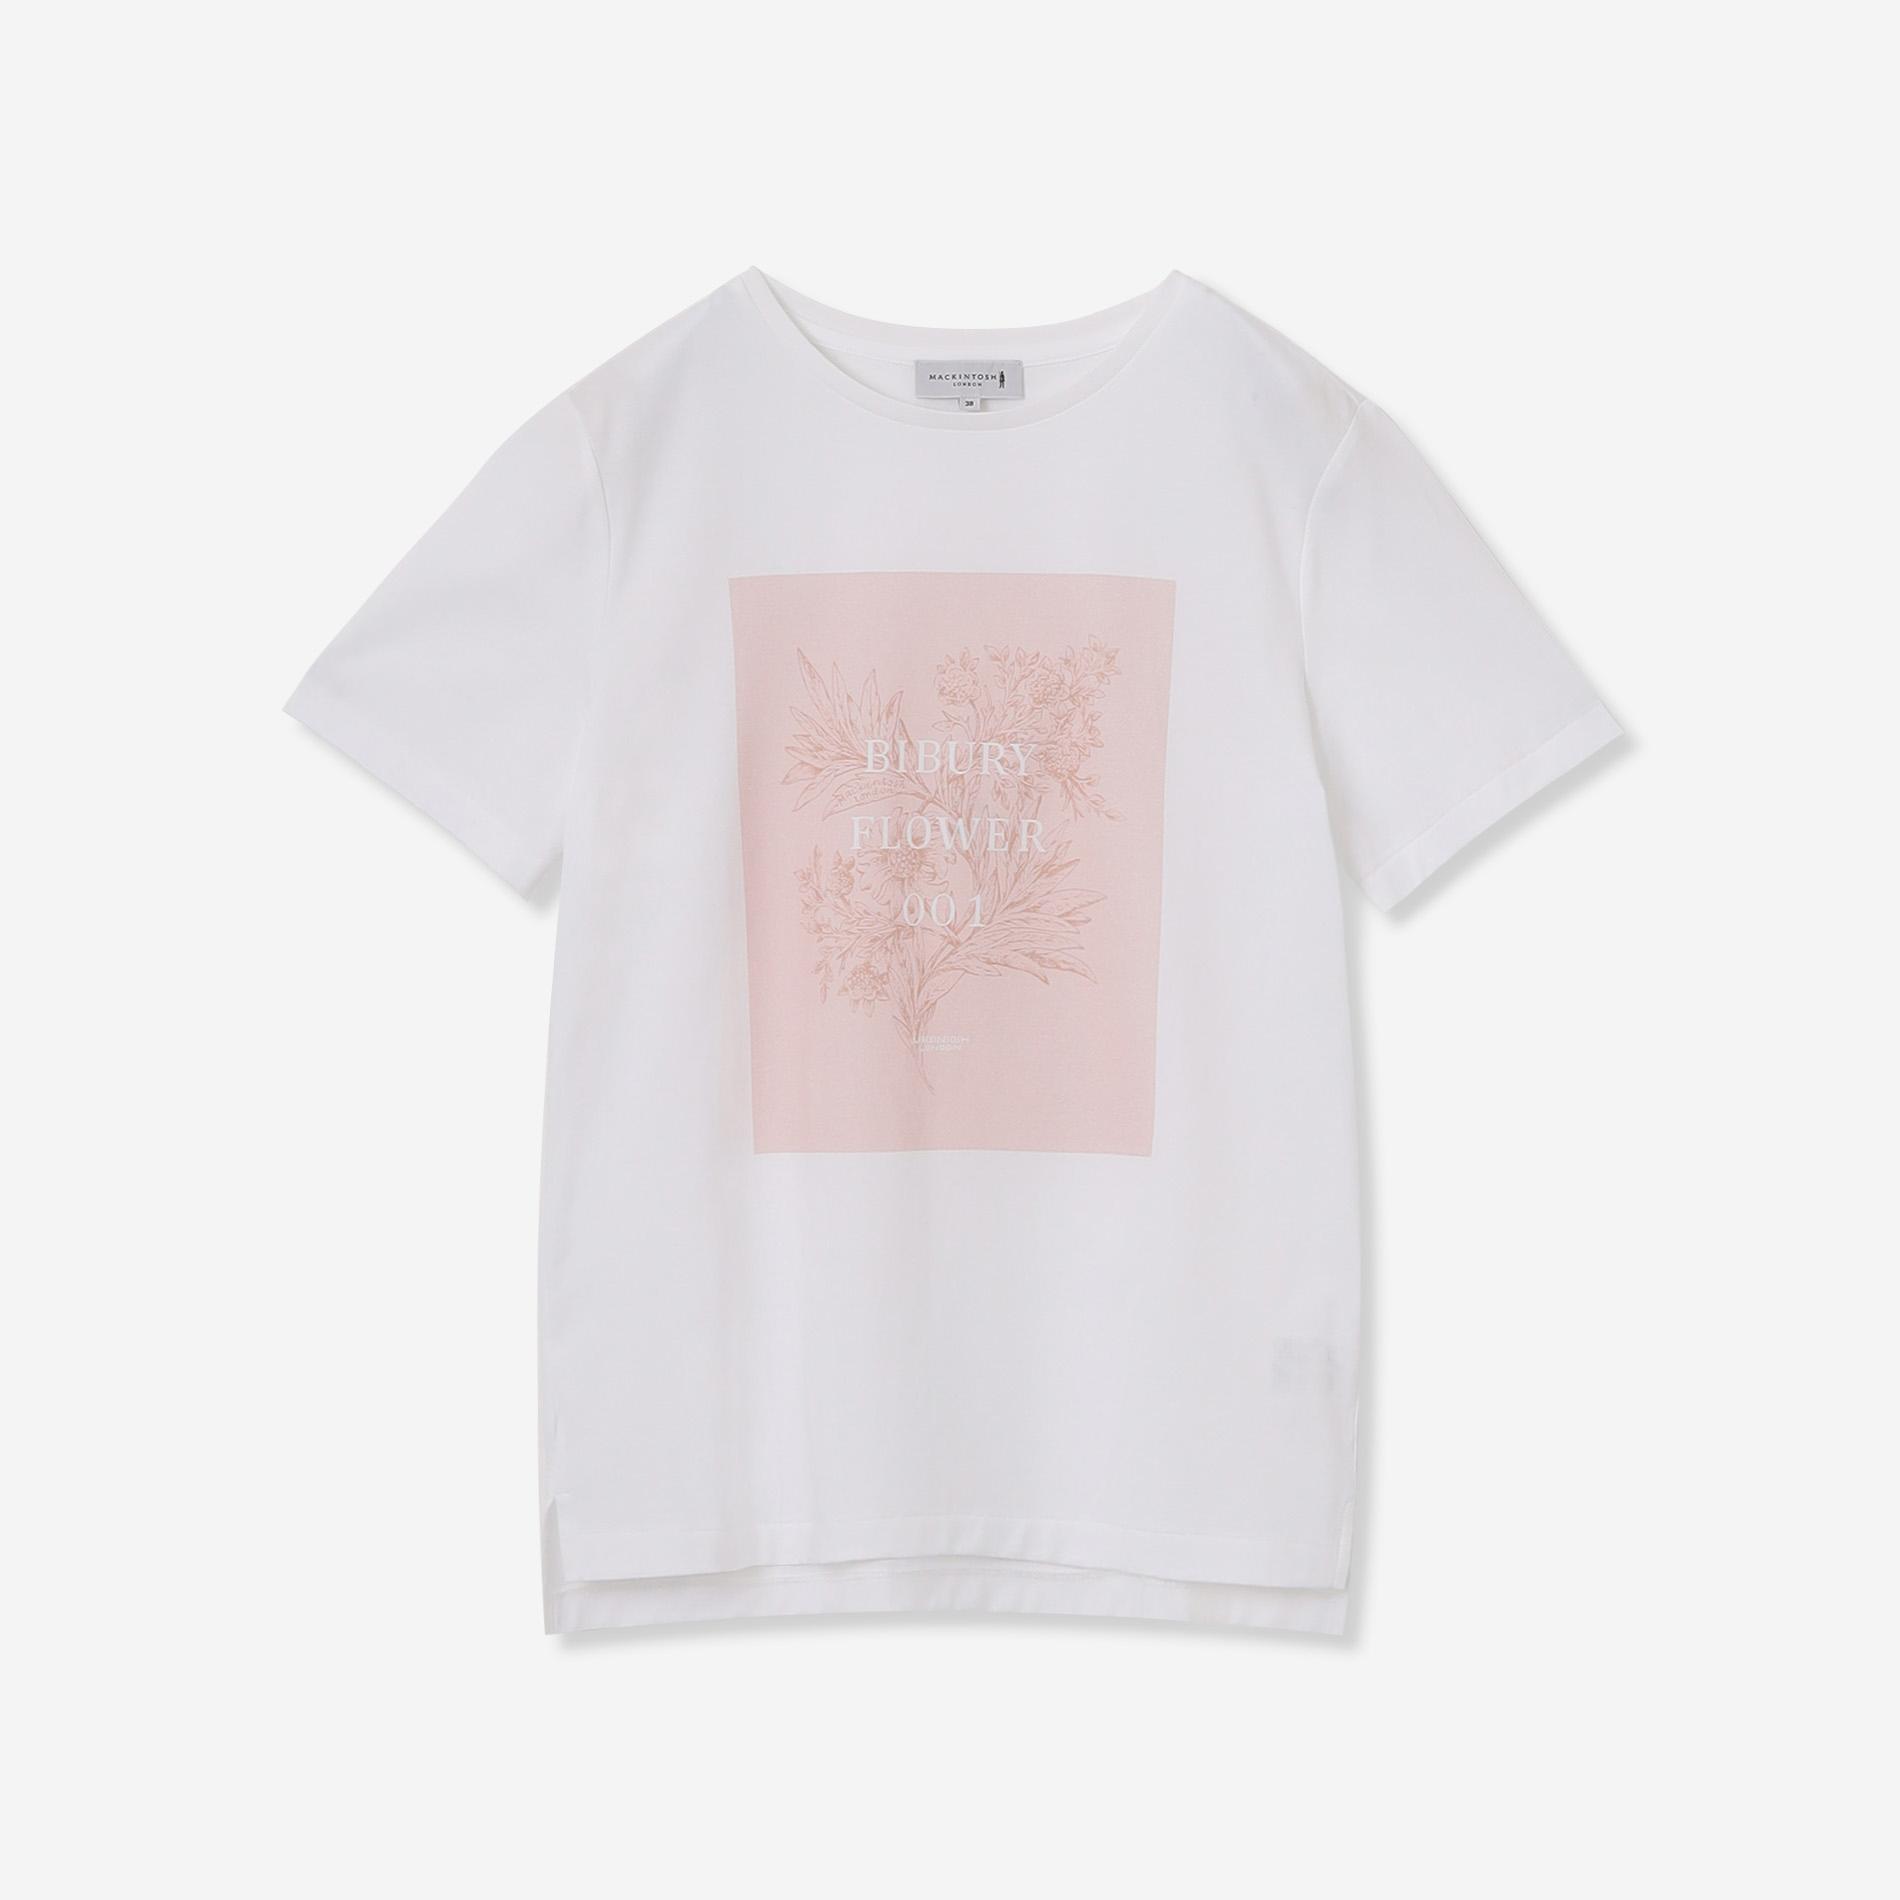 【BIBURY FLOWER】001プリントTシャツ